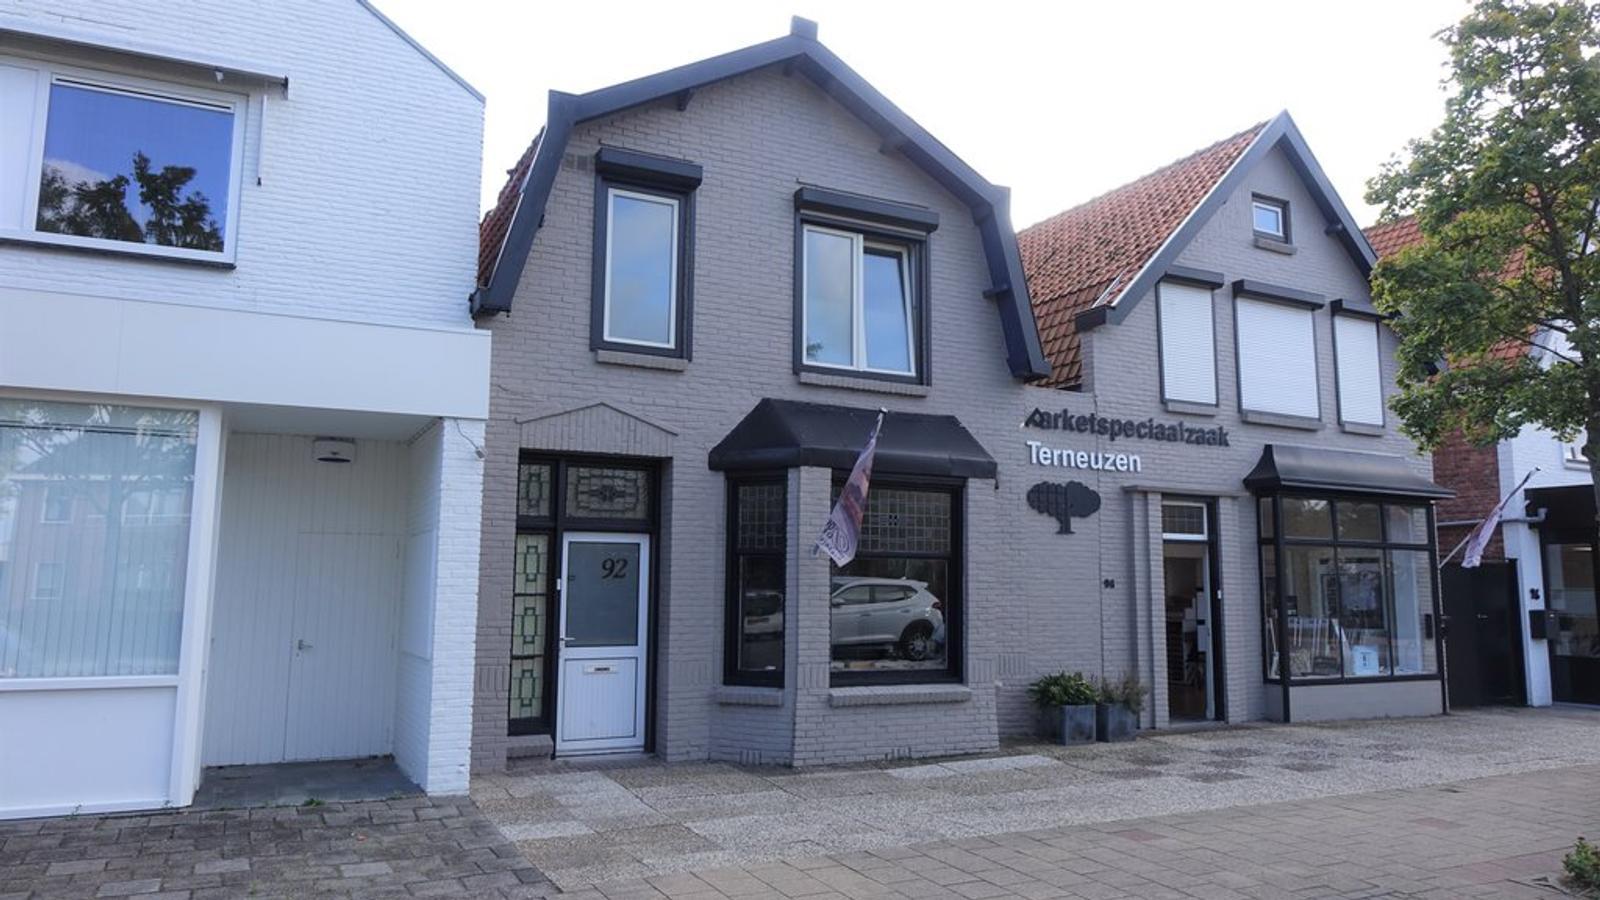 Axelsestraat 92